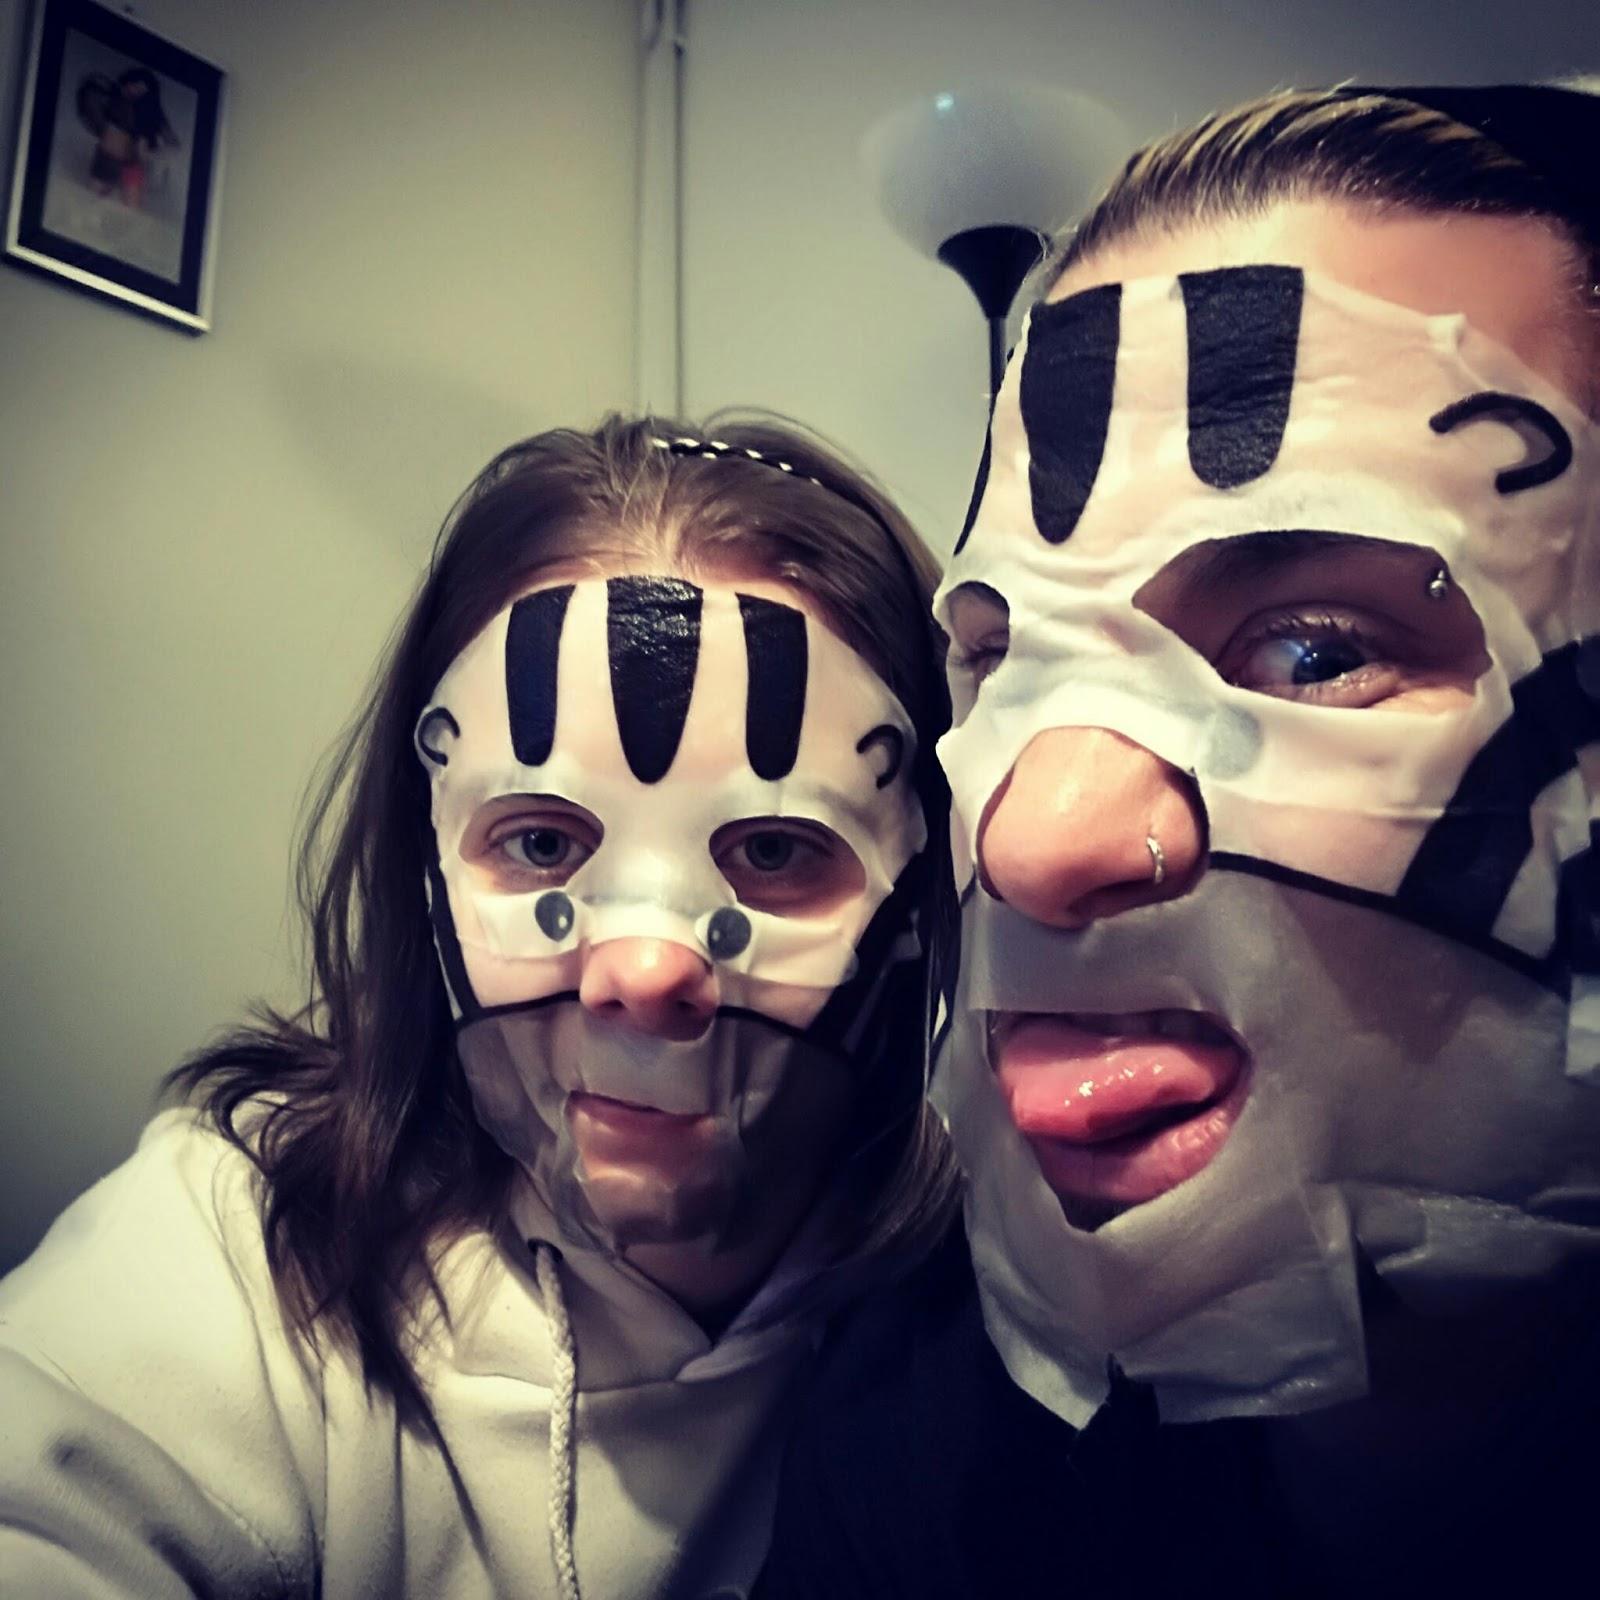 The adventures of Lau~: Zebra face masks